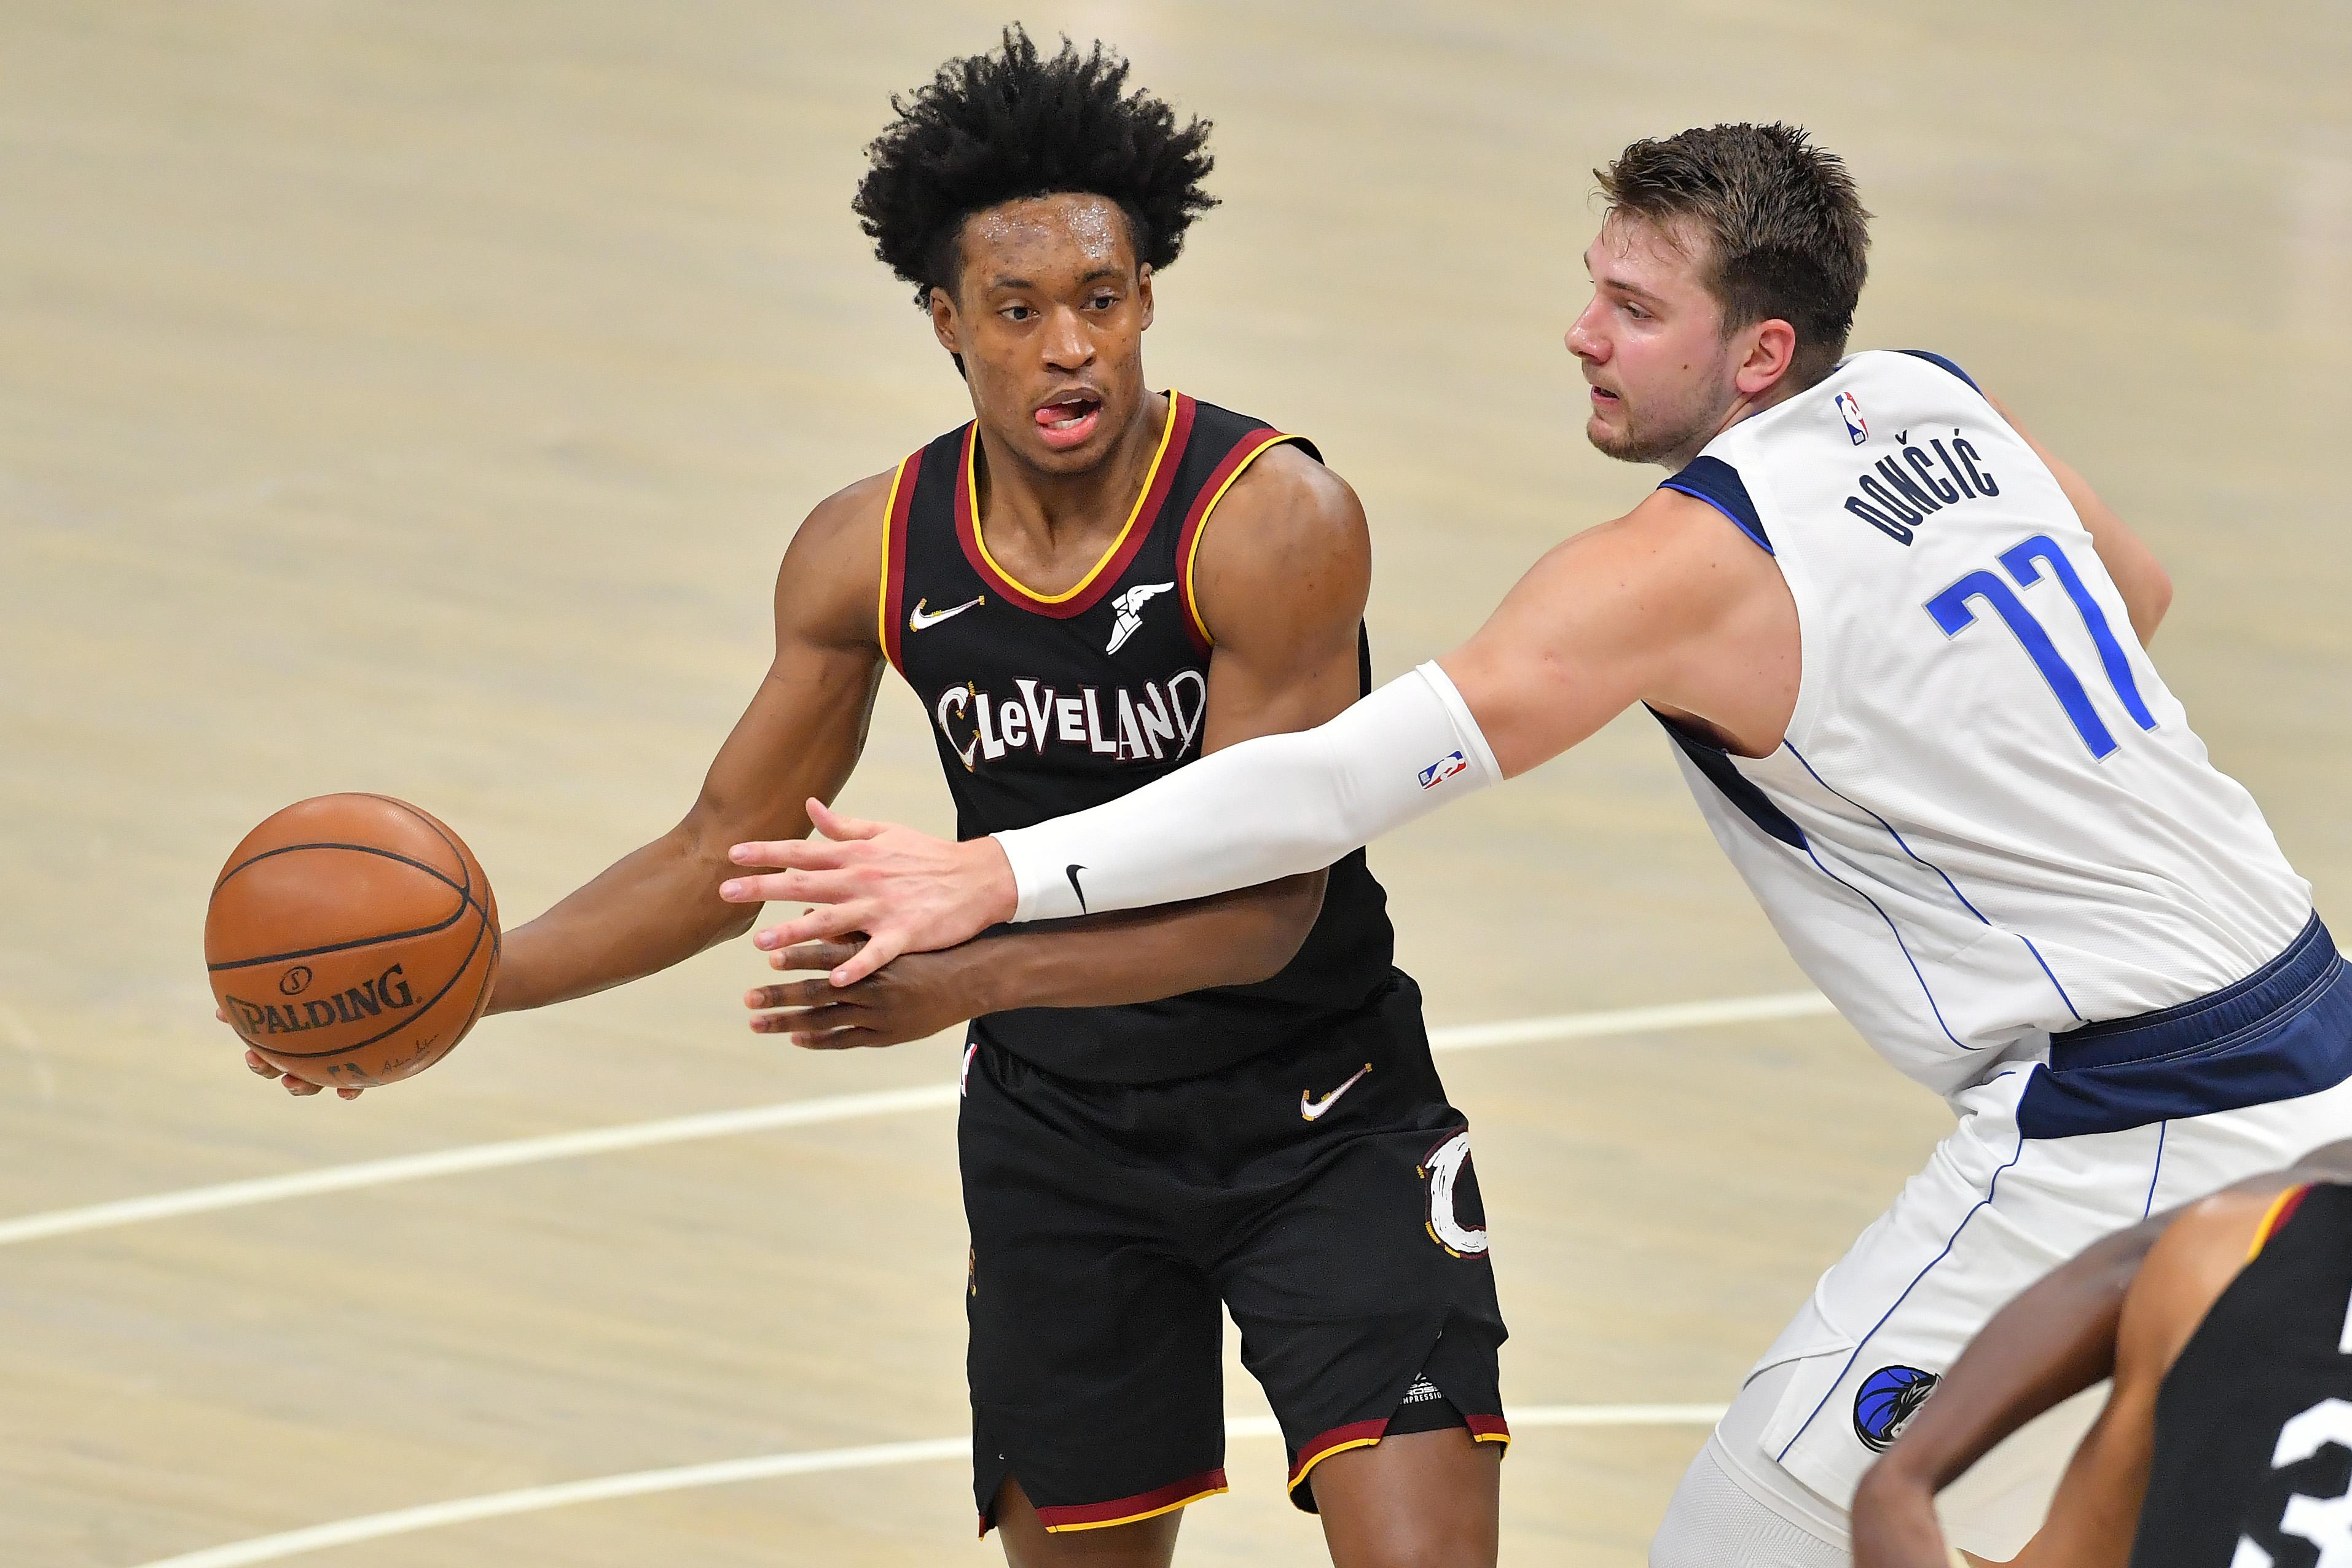 Dallas Mavericks v Cleveland Cavaliers